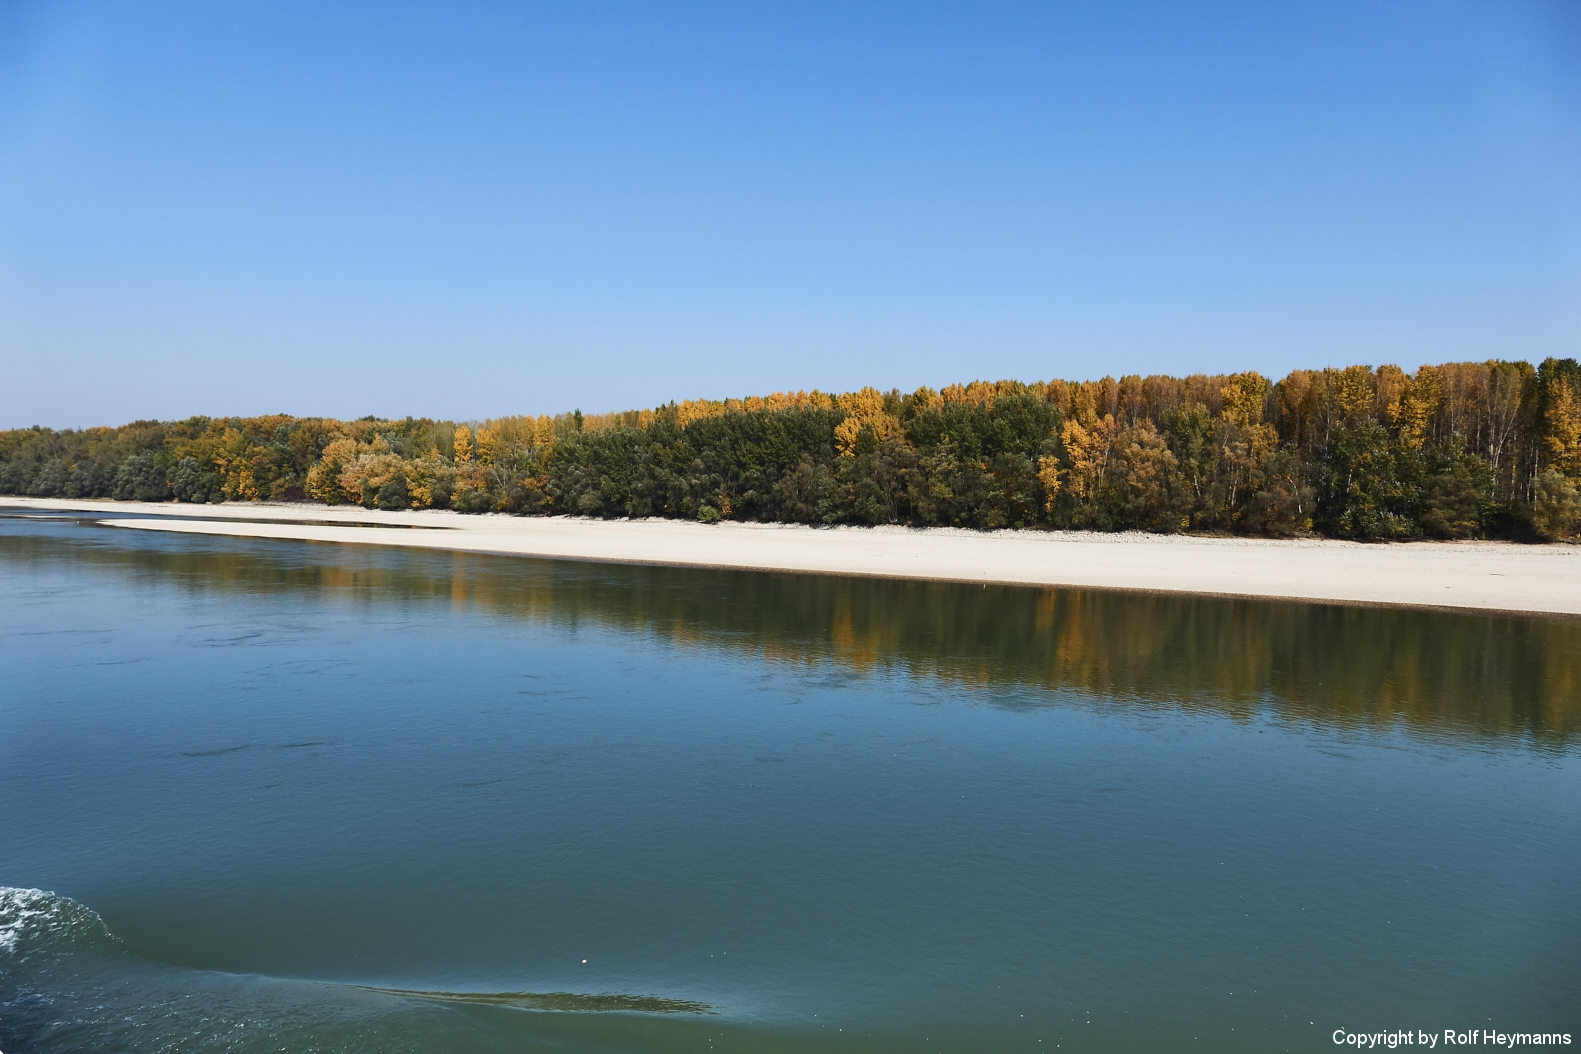 Donaulandschaft #3